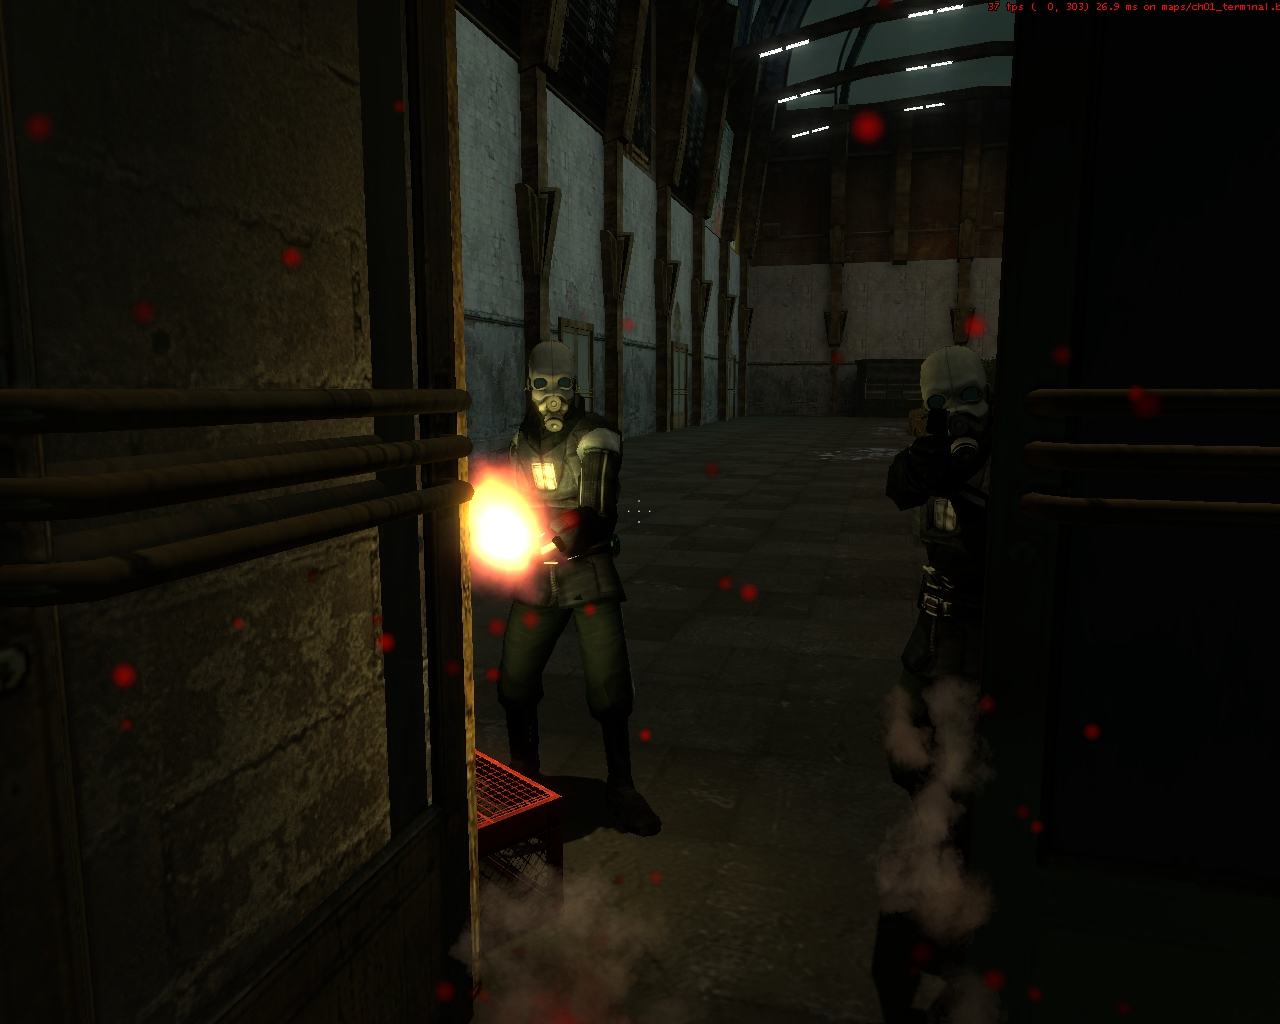 ch01_terminal0343.jpg - Half-Life 2 ch01_terminal, Dark Interval, Dark Interval: Part 1